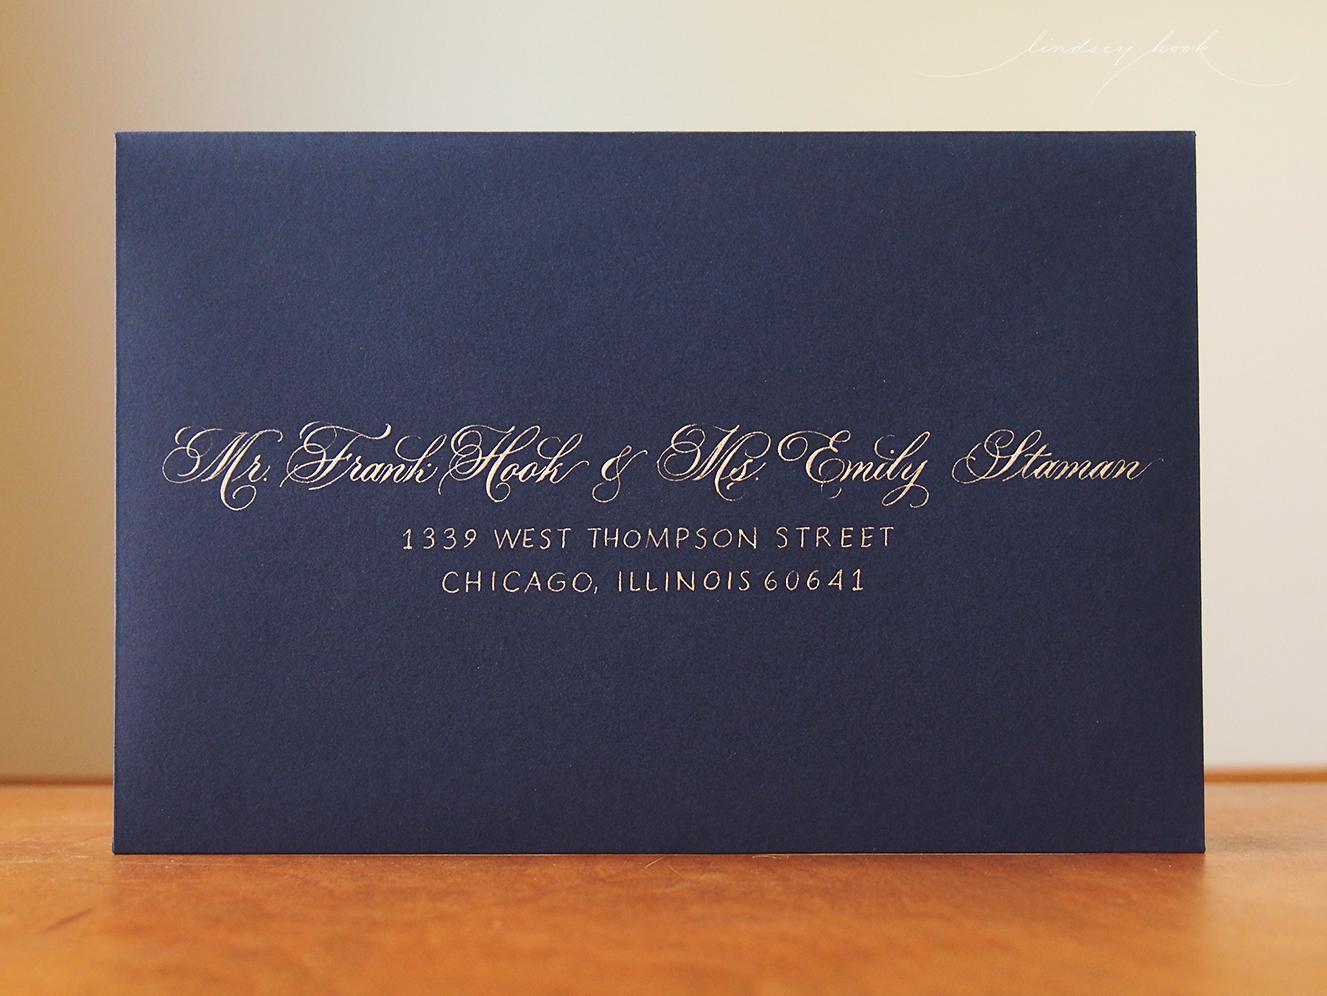 Flourished Parfumerie and Block Caps Envelope